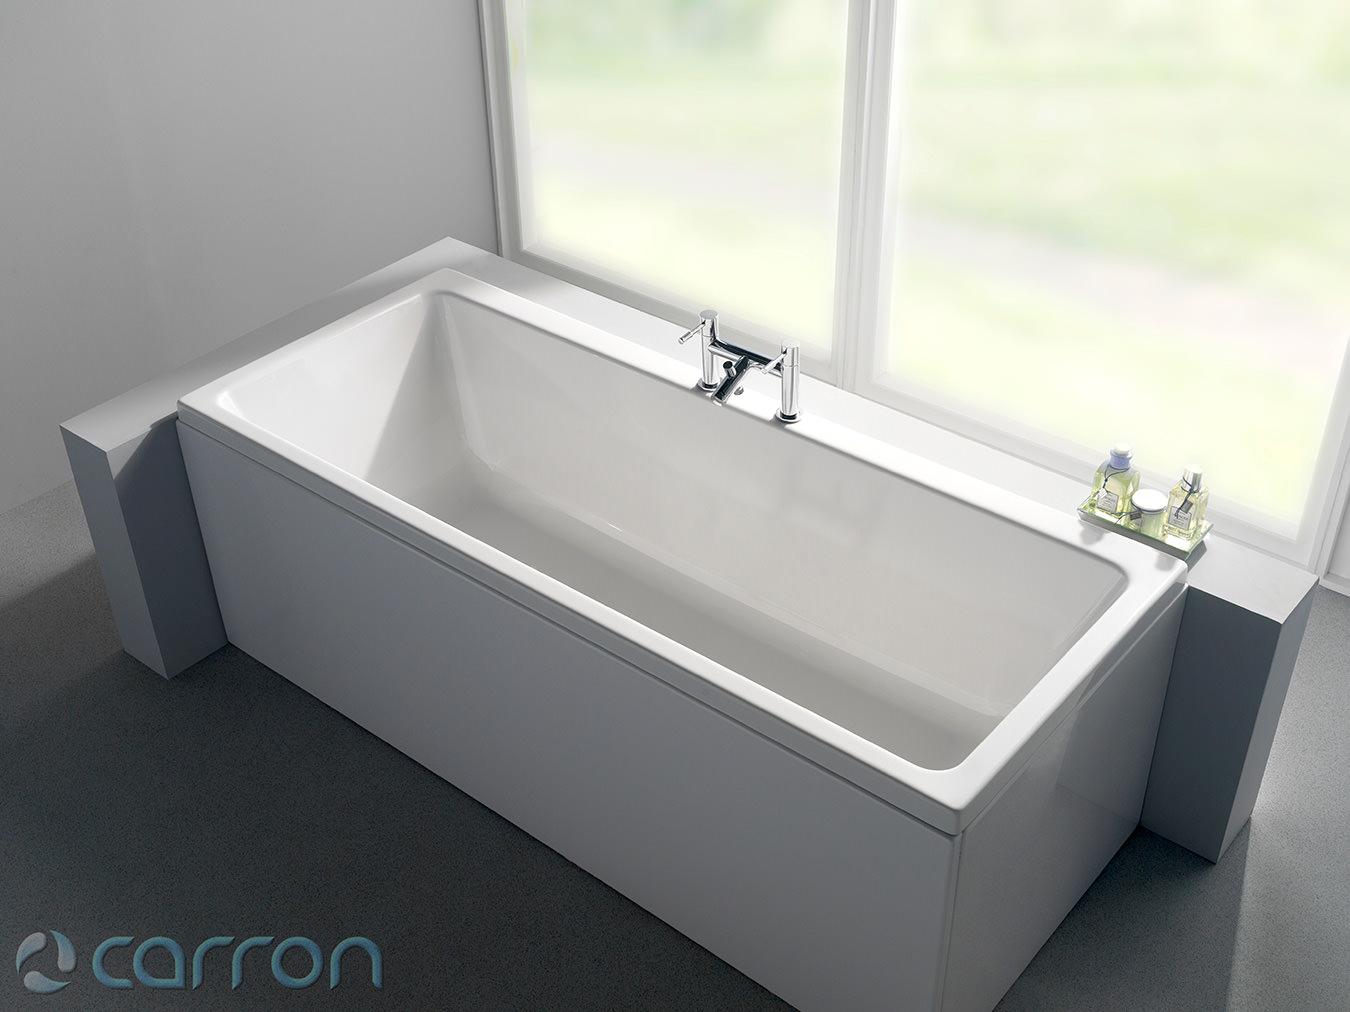 Carron Quantum 5mm Acrylic Single Ended Bath 1500 x 700mm